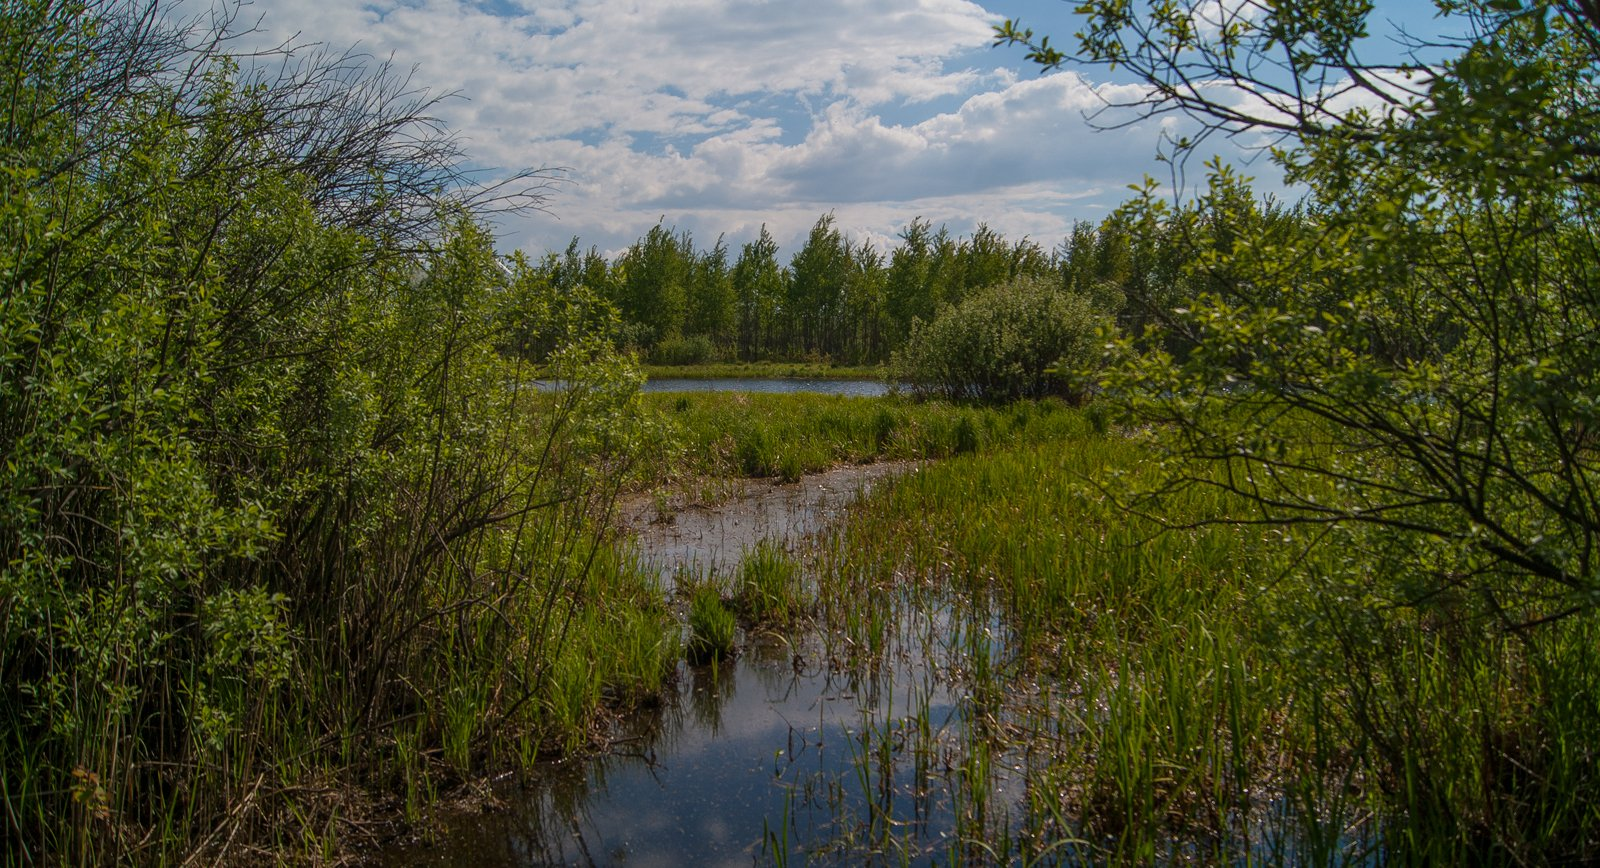 озеро «Голосок» и участок нижнего течения реки Рача